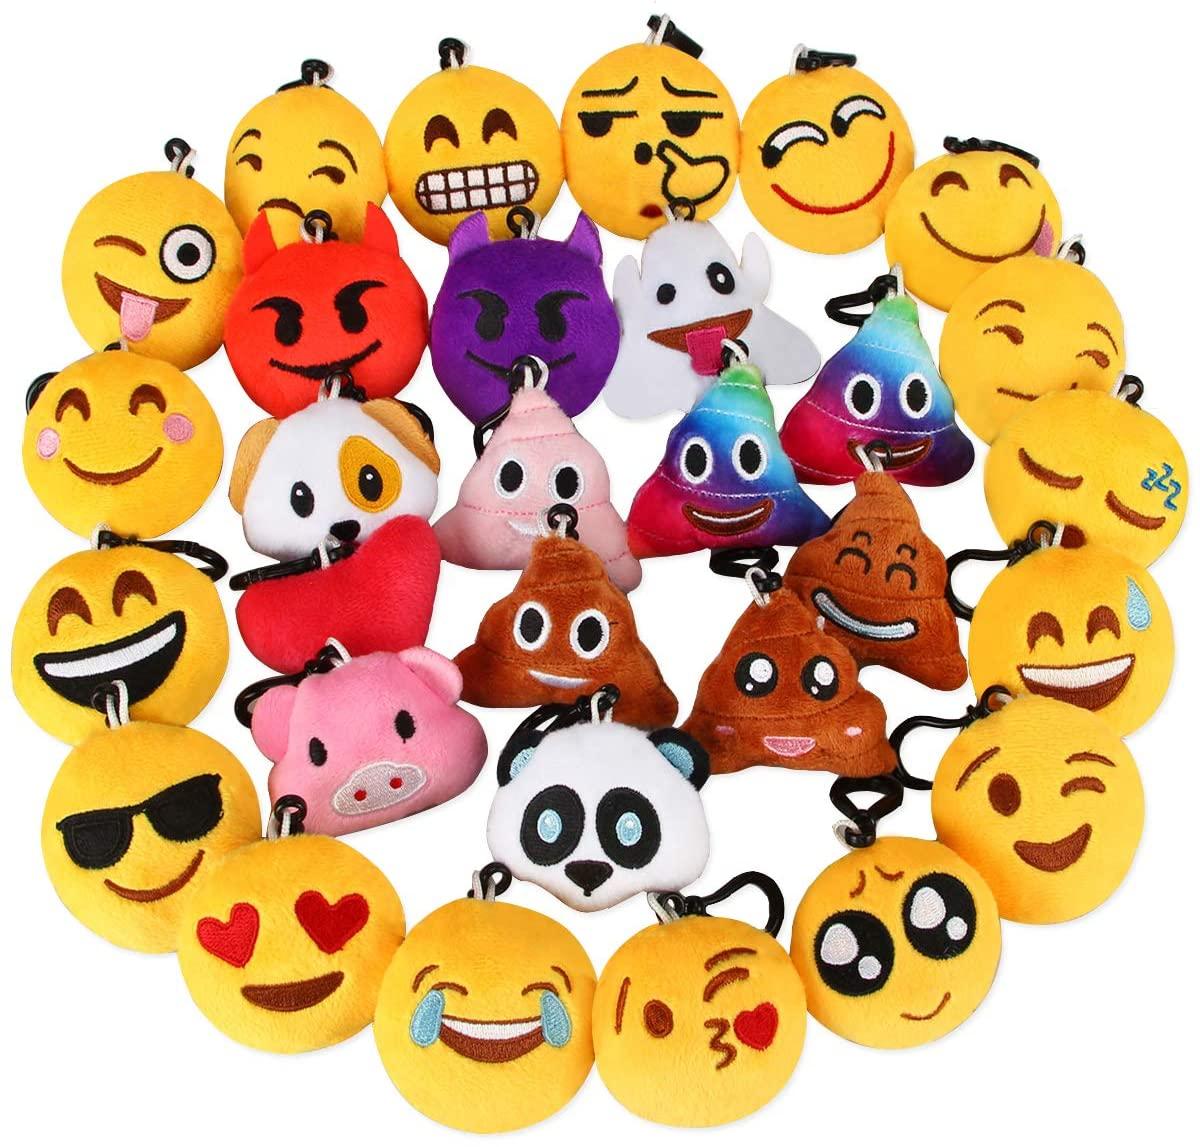 Dreampark Emotion Keychain, Emotion Plush Key Chain Bulk Toy Christmas Birthday Party Favors Supplies, Treasure Box Rewards Carnival Prizes for Kids Boys and Girls, 2